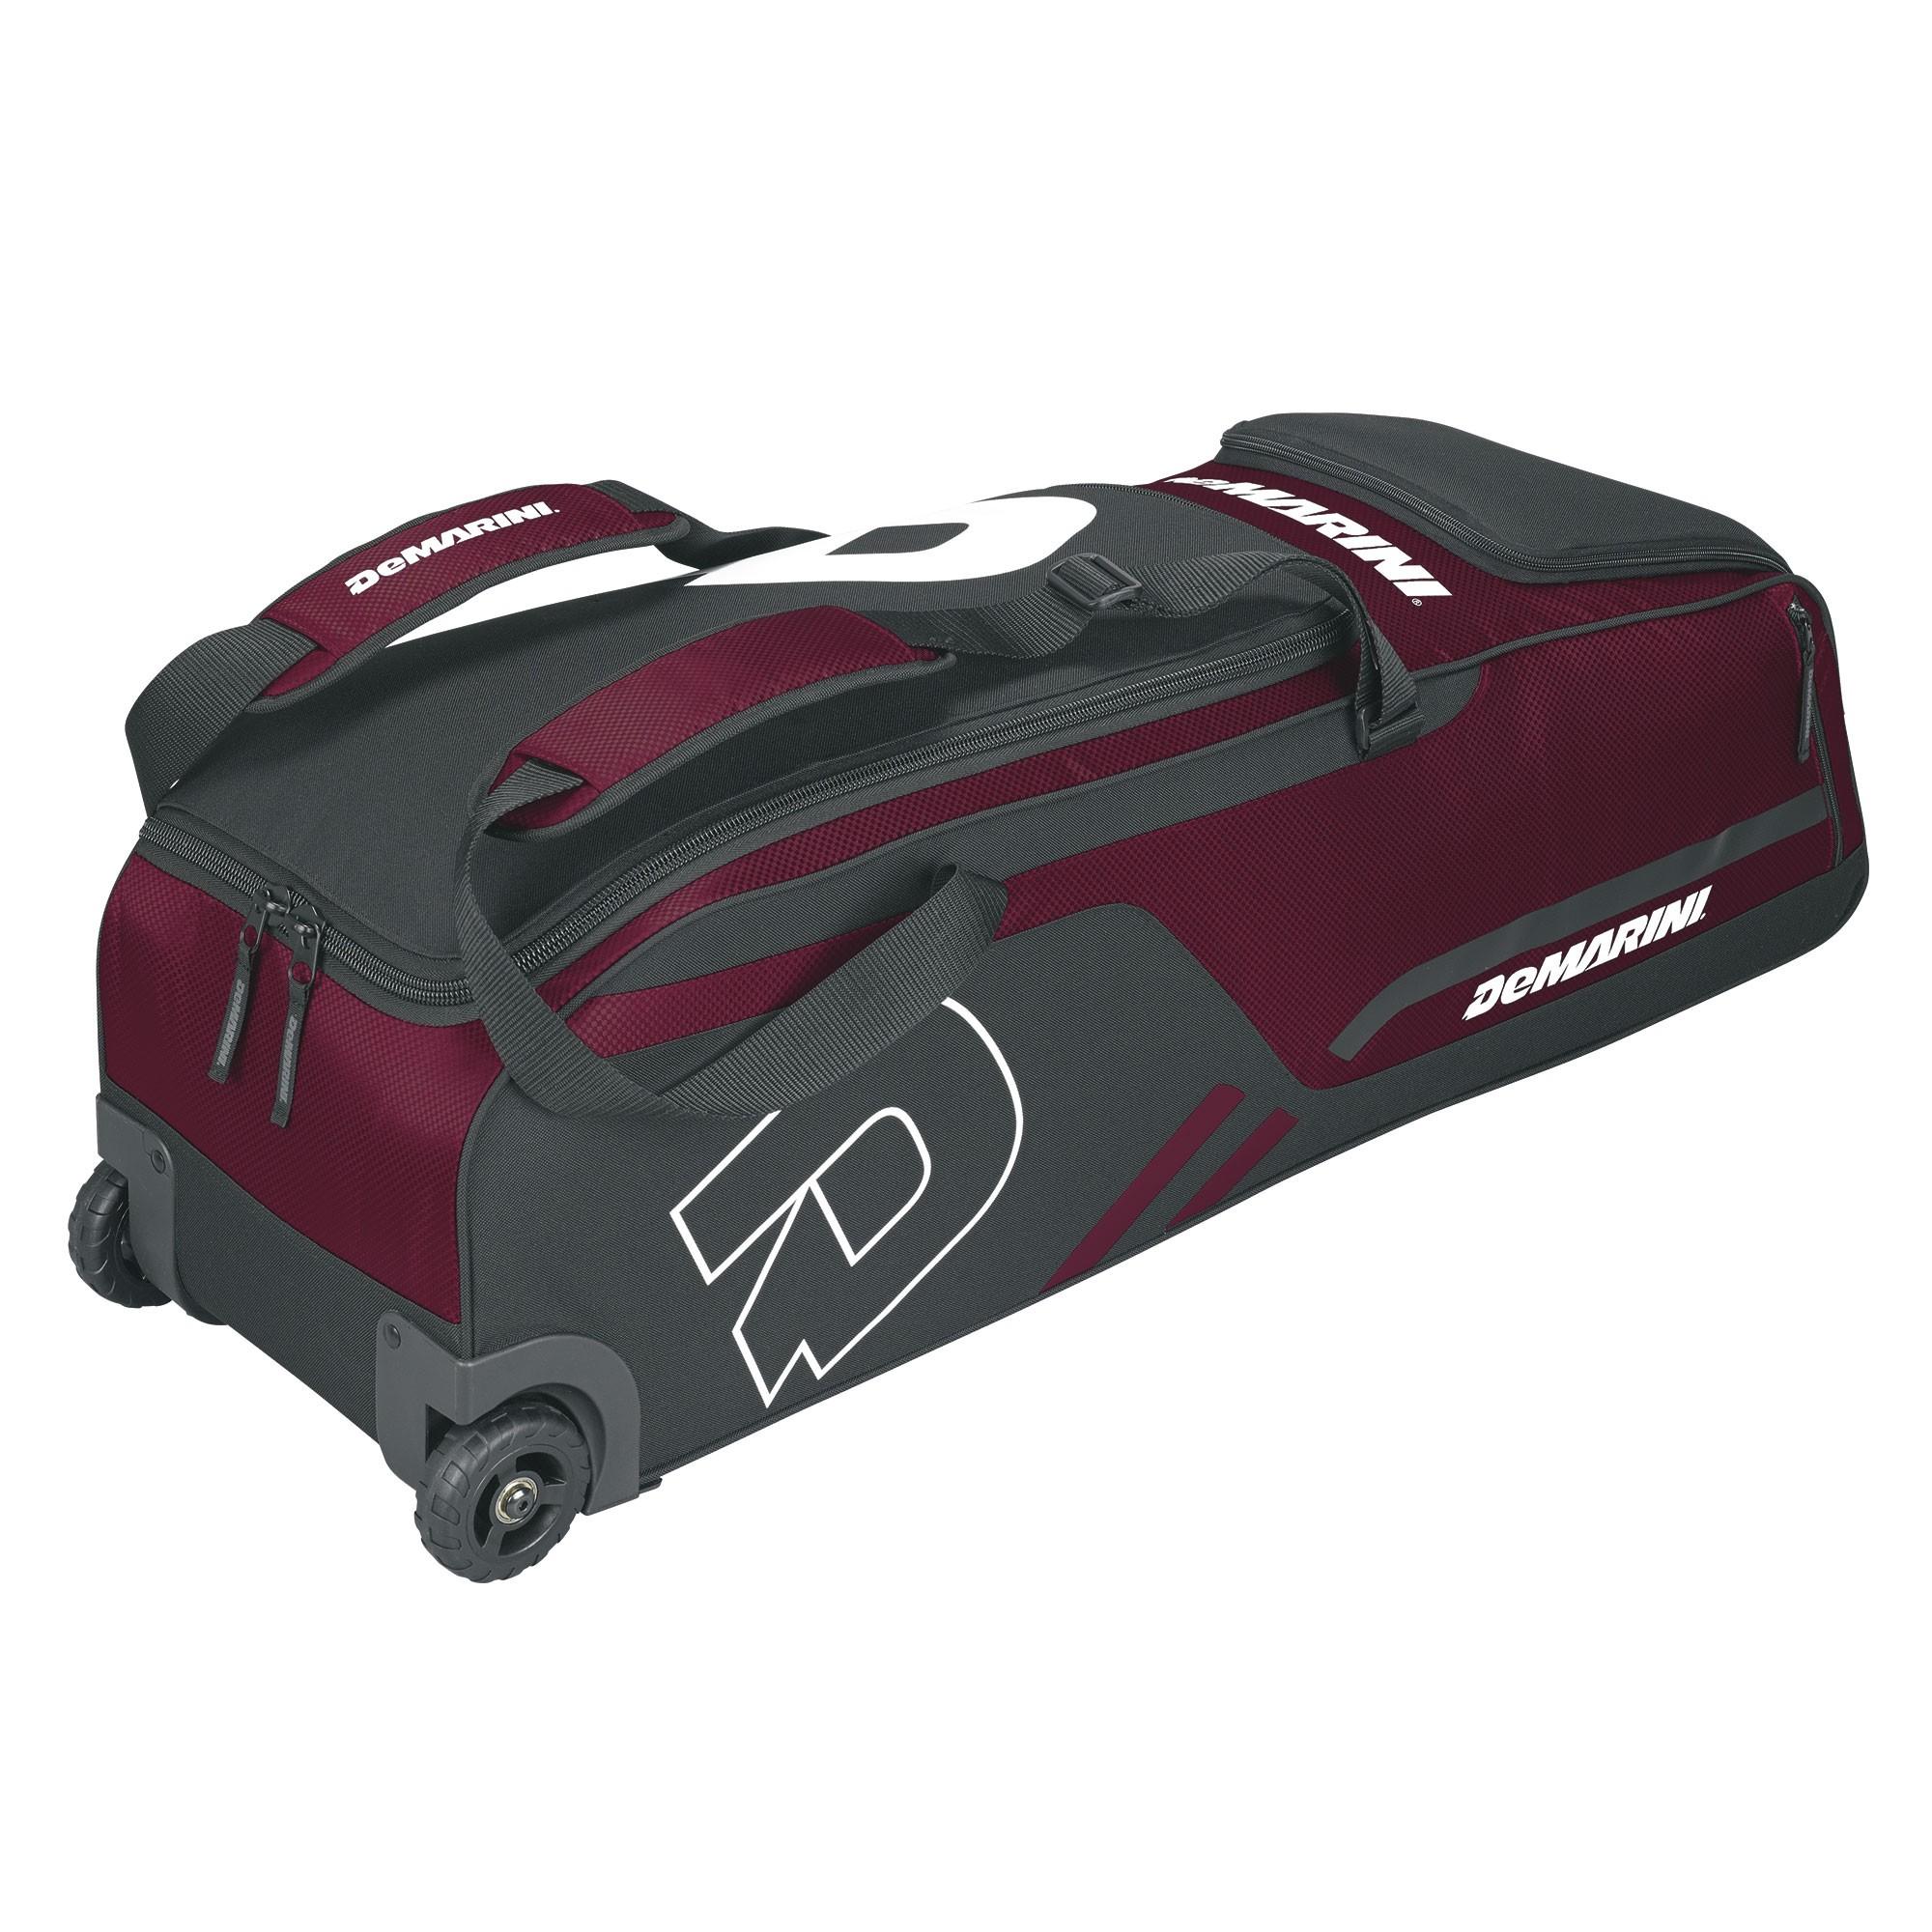 5426c0614b DeMarini Momentum Baseball Softball Wheel Bag - Maroon (Red ...